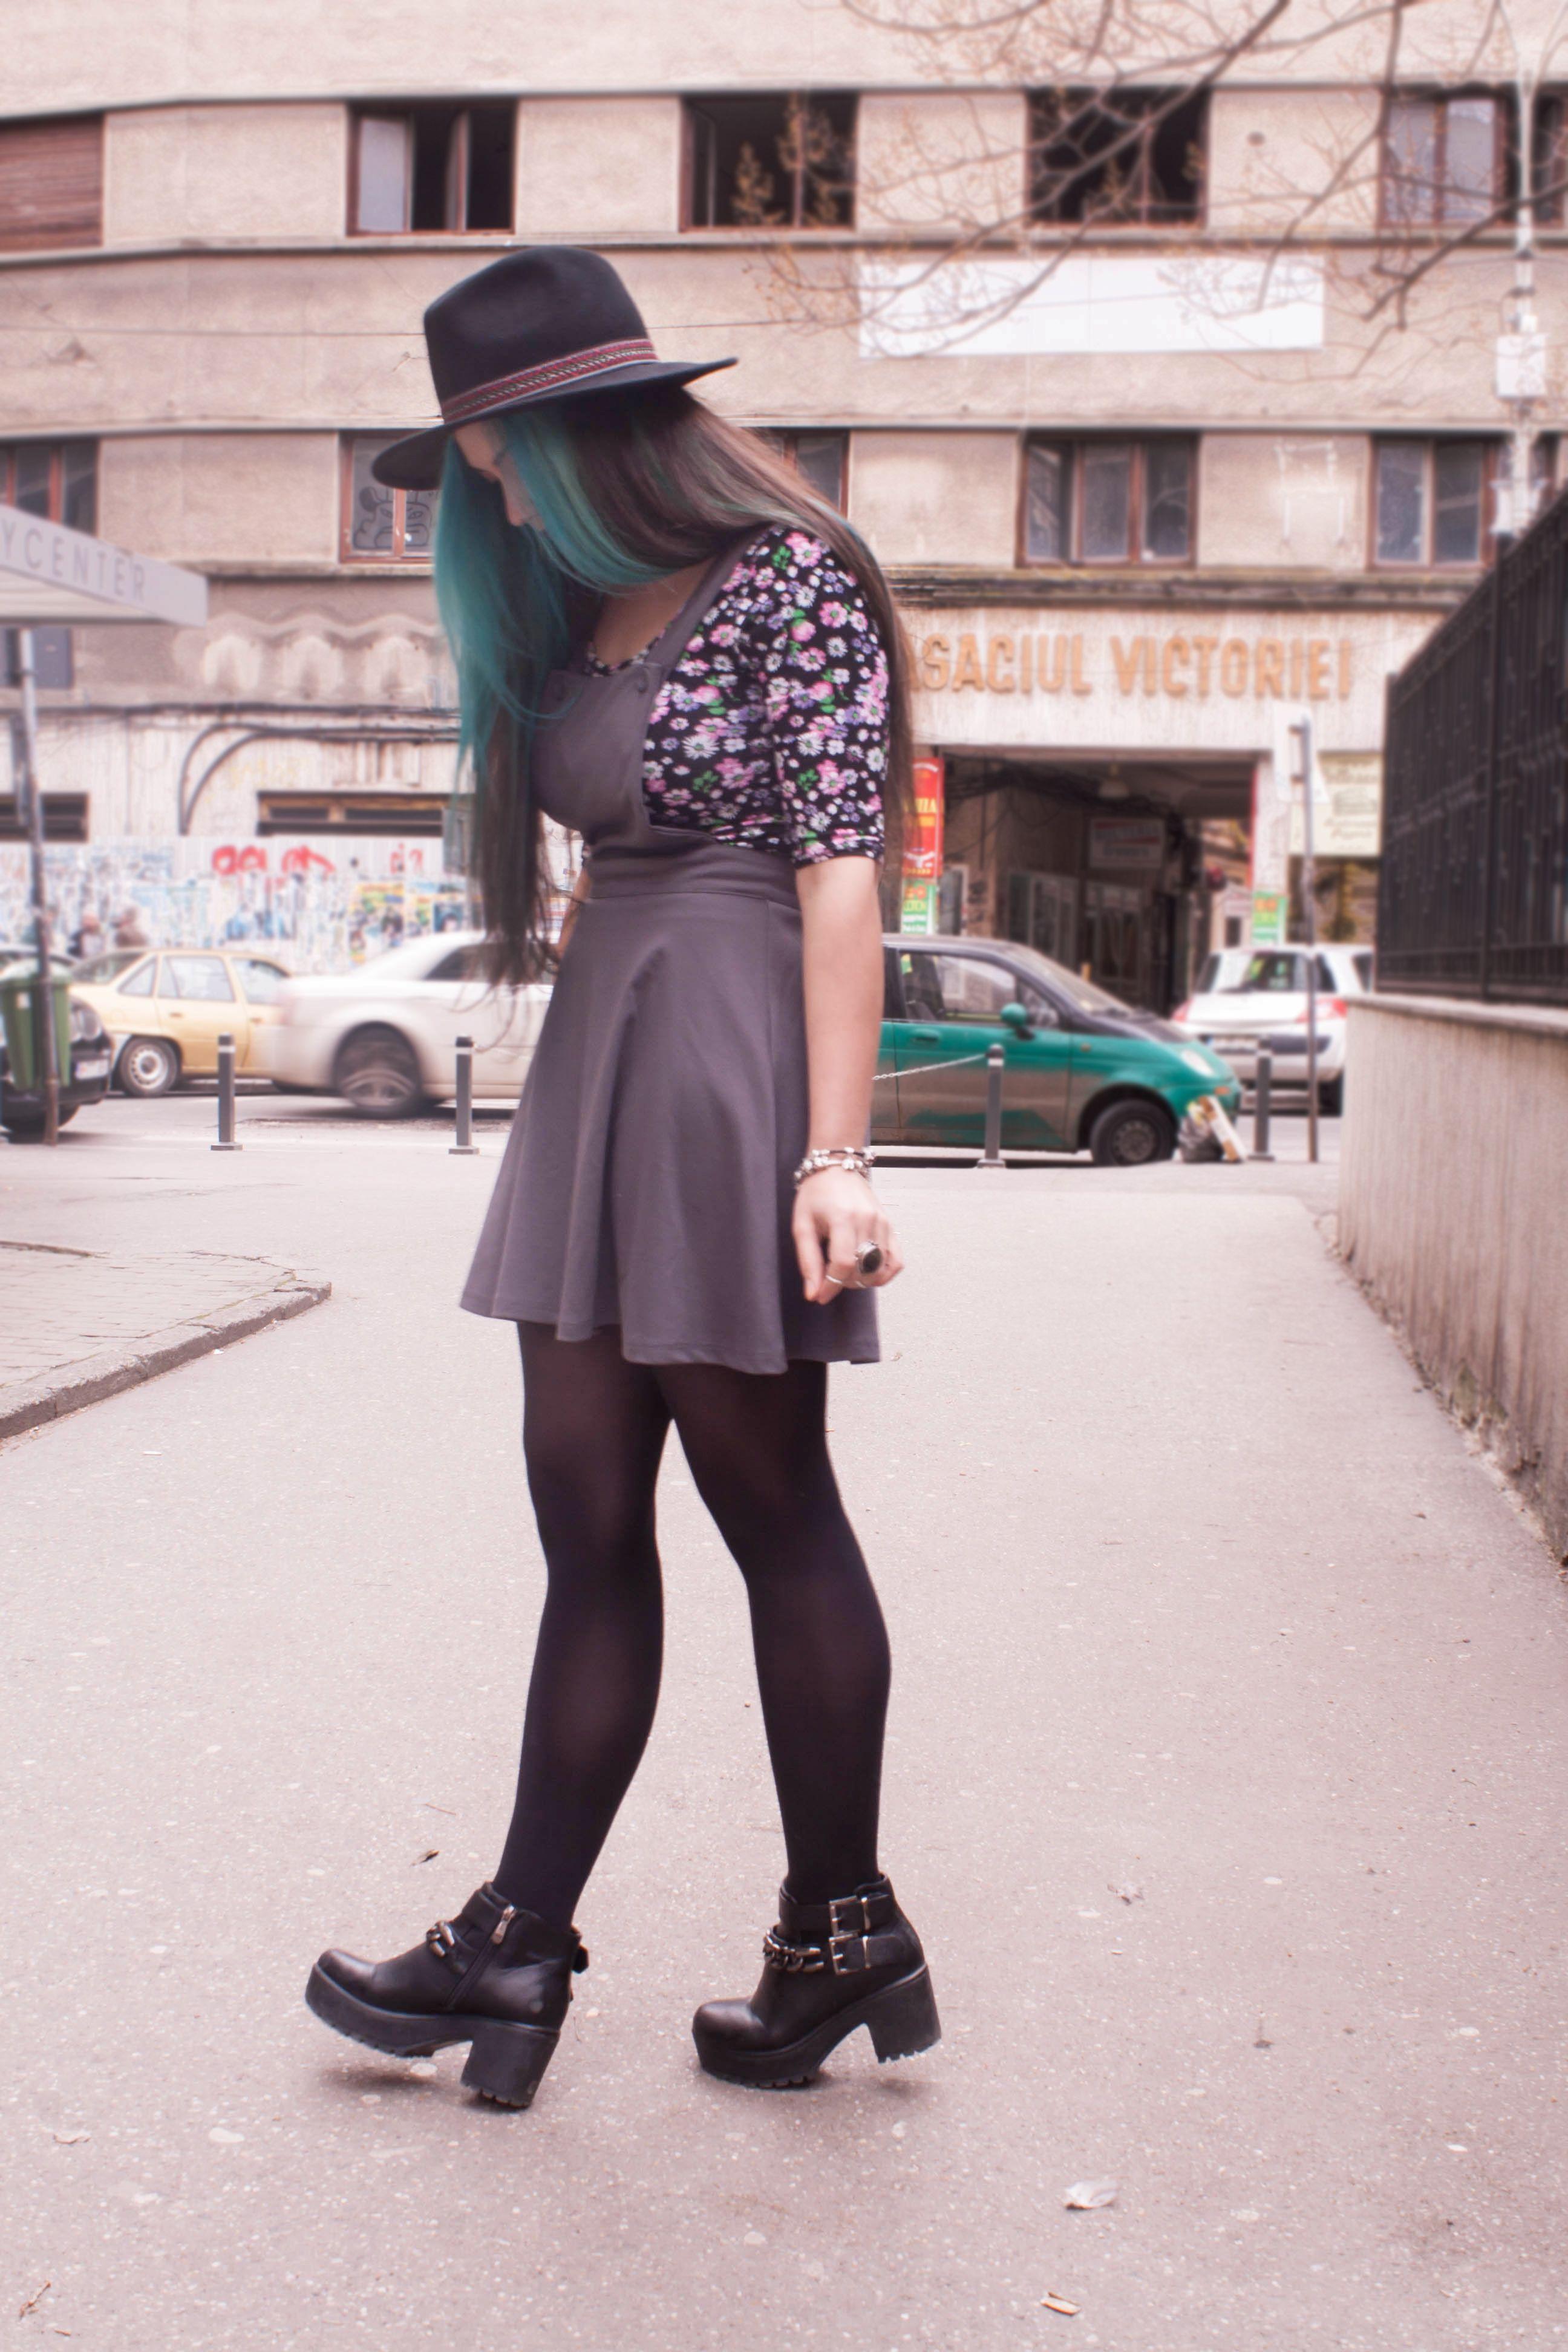 #fashion #dress #hat #evasplace #turquoise #hair